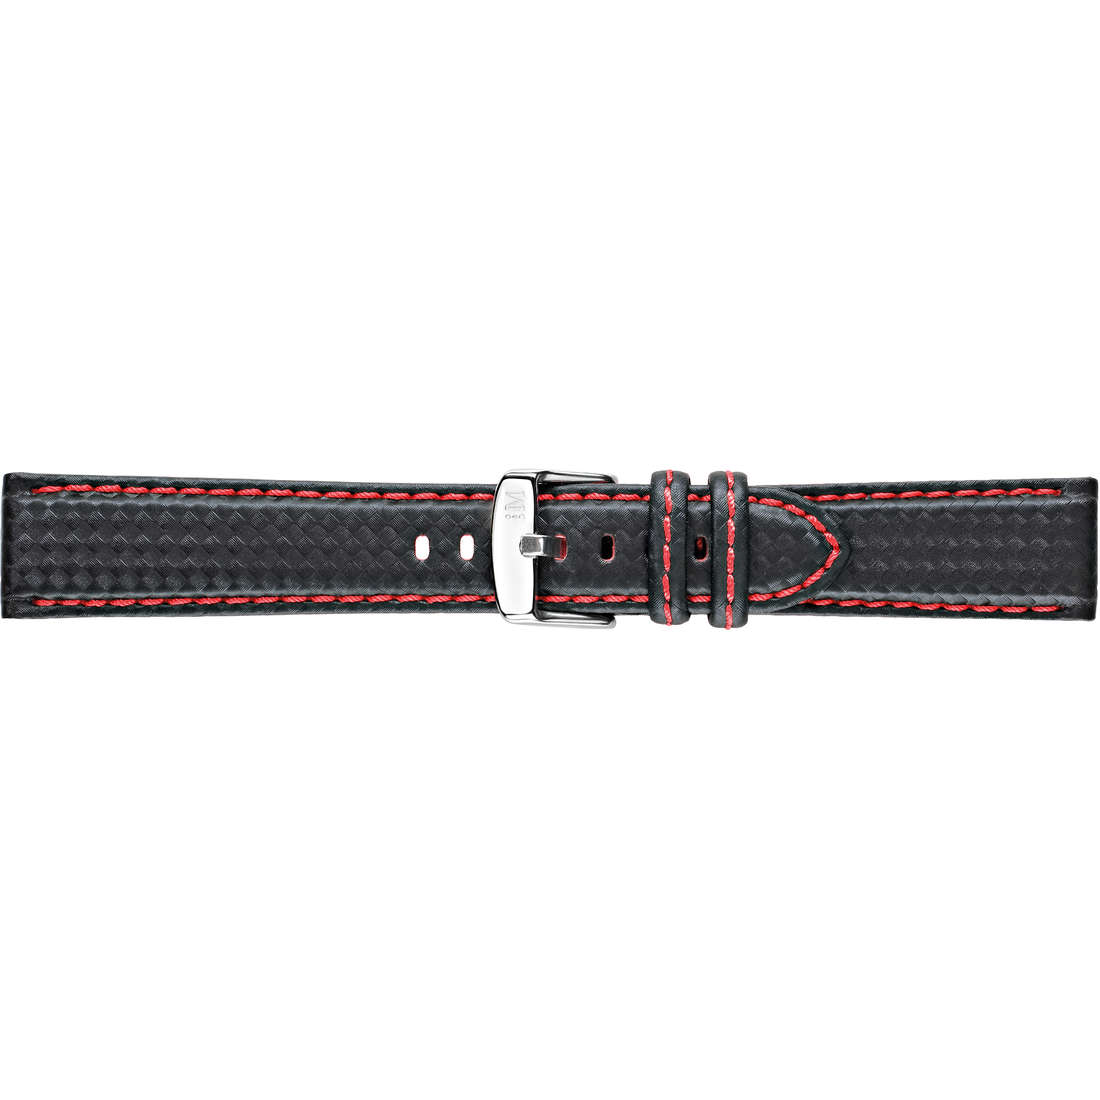 montre bande de montres homme Morellato Linea Sport A01U3586977883CR20